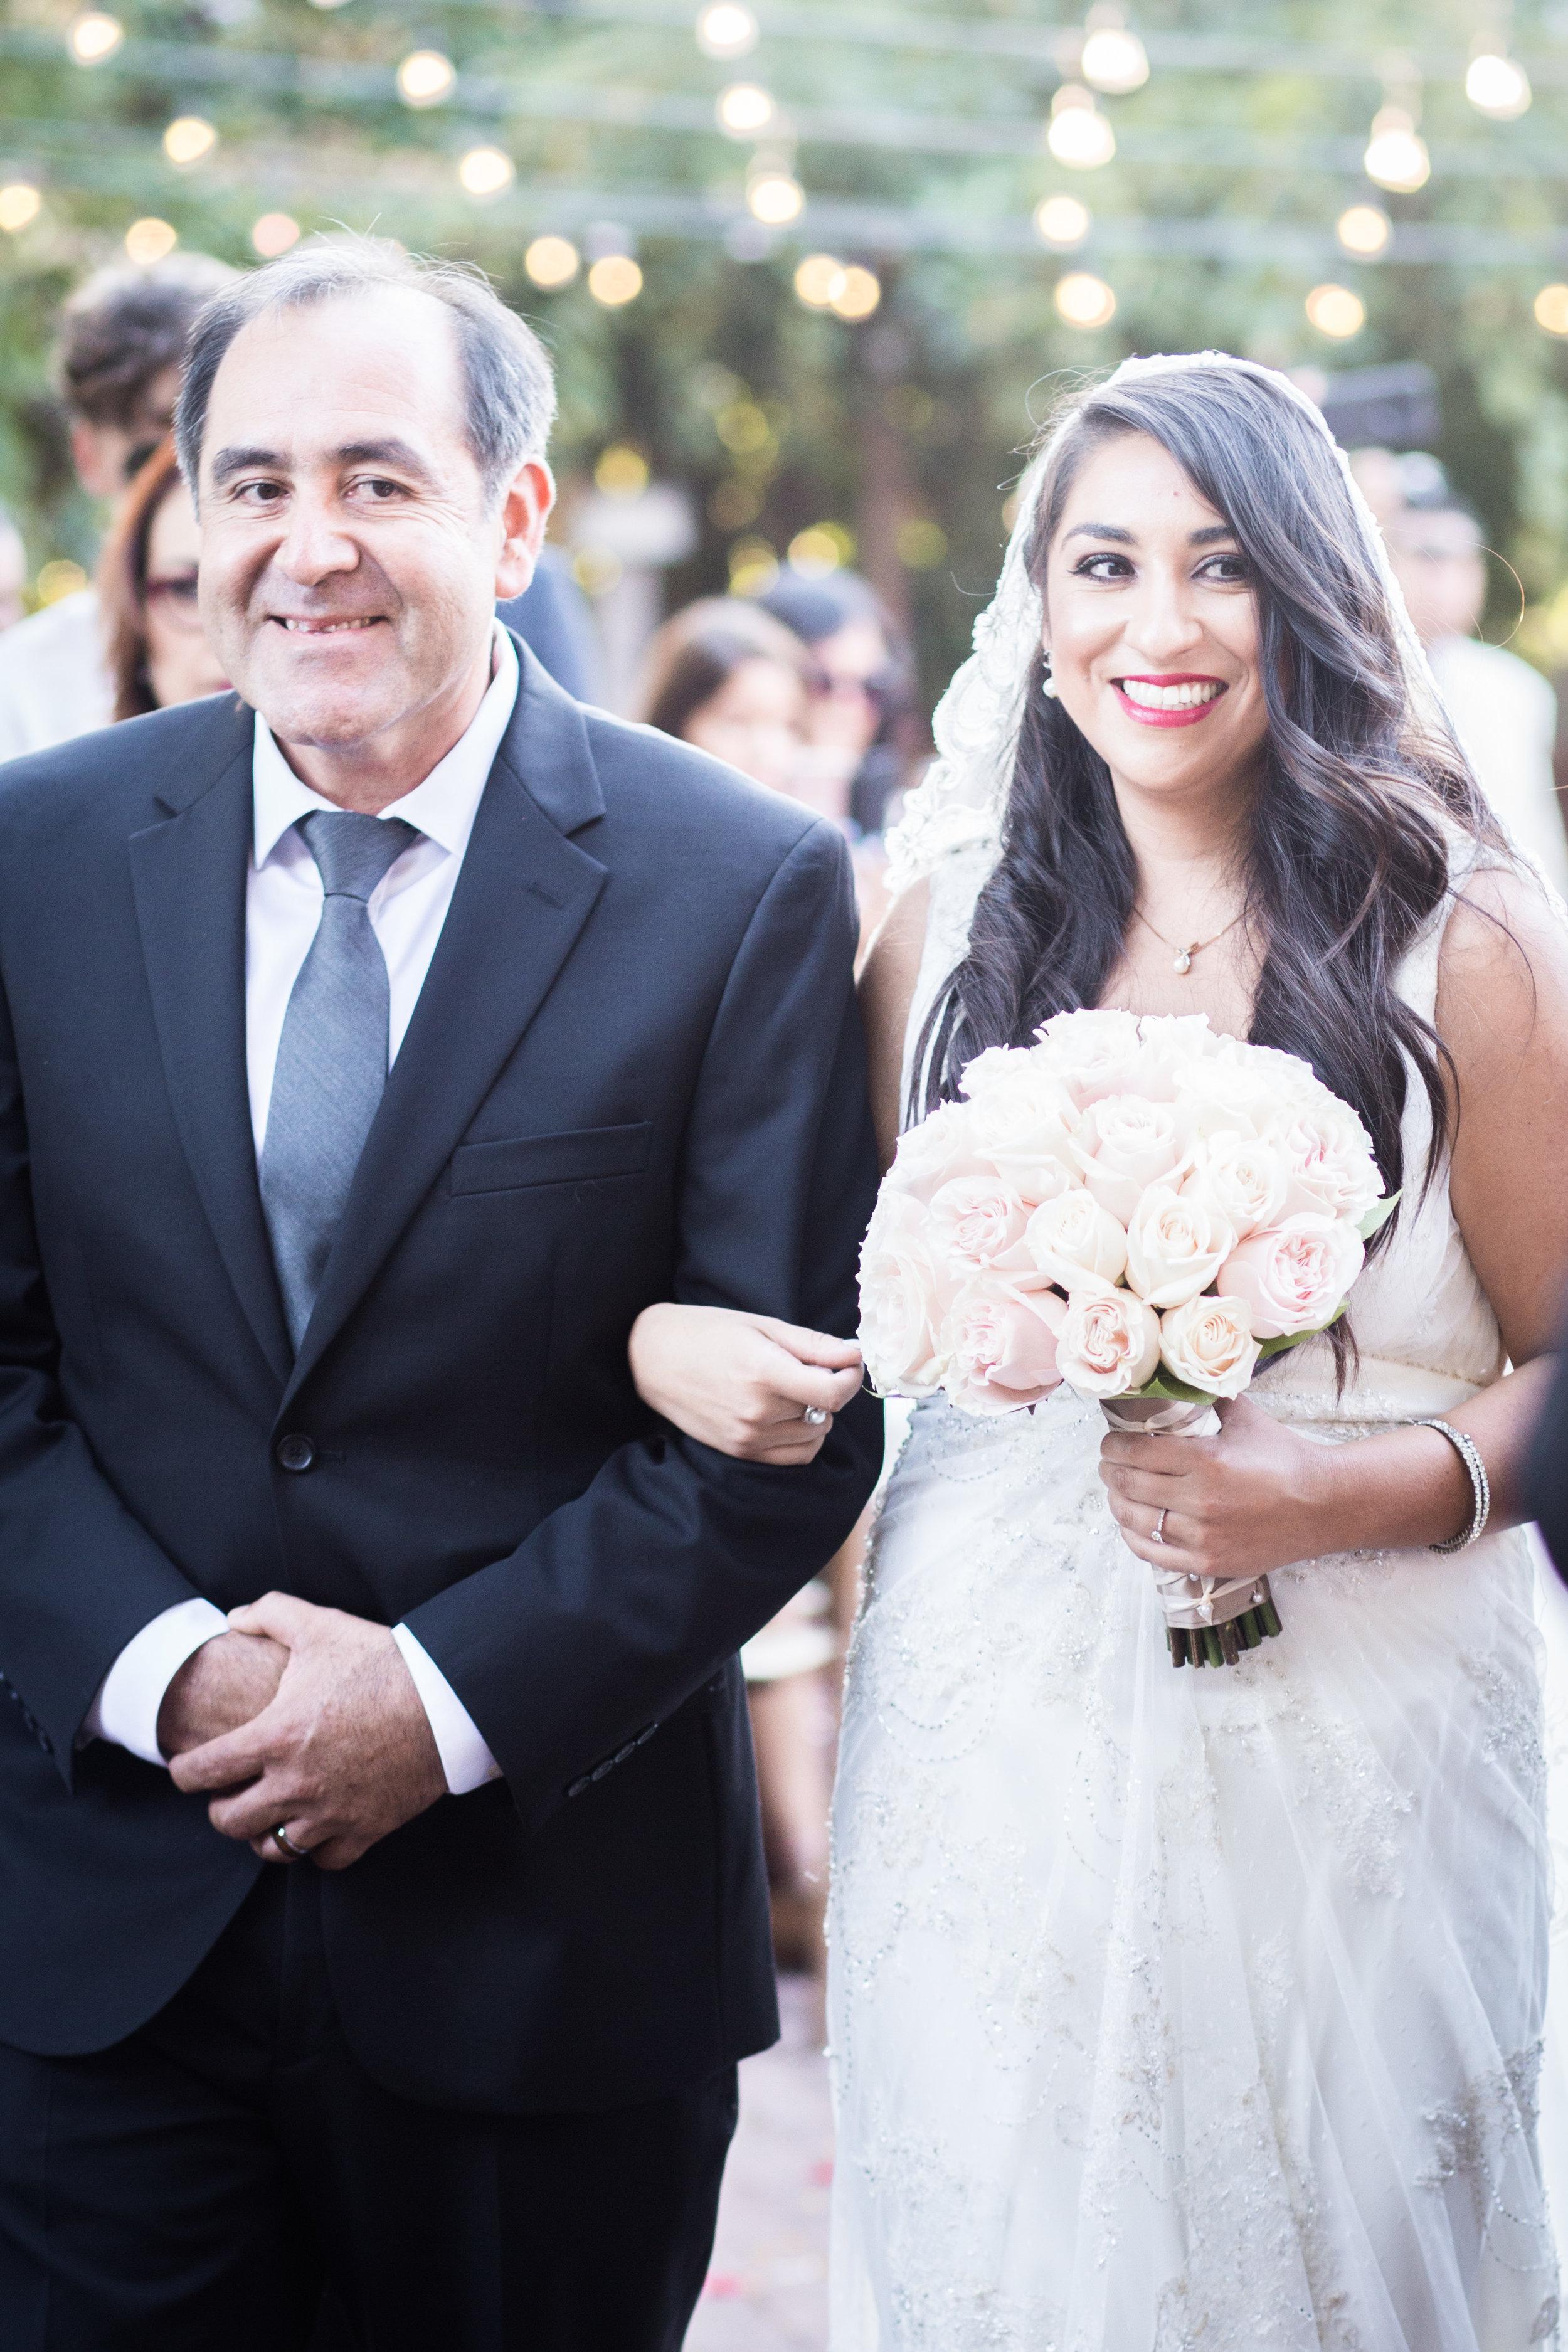 Andrea&Adrian_Wedding-314.jpg